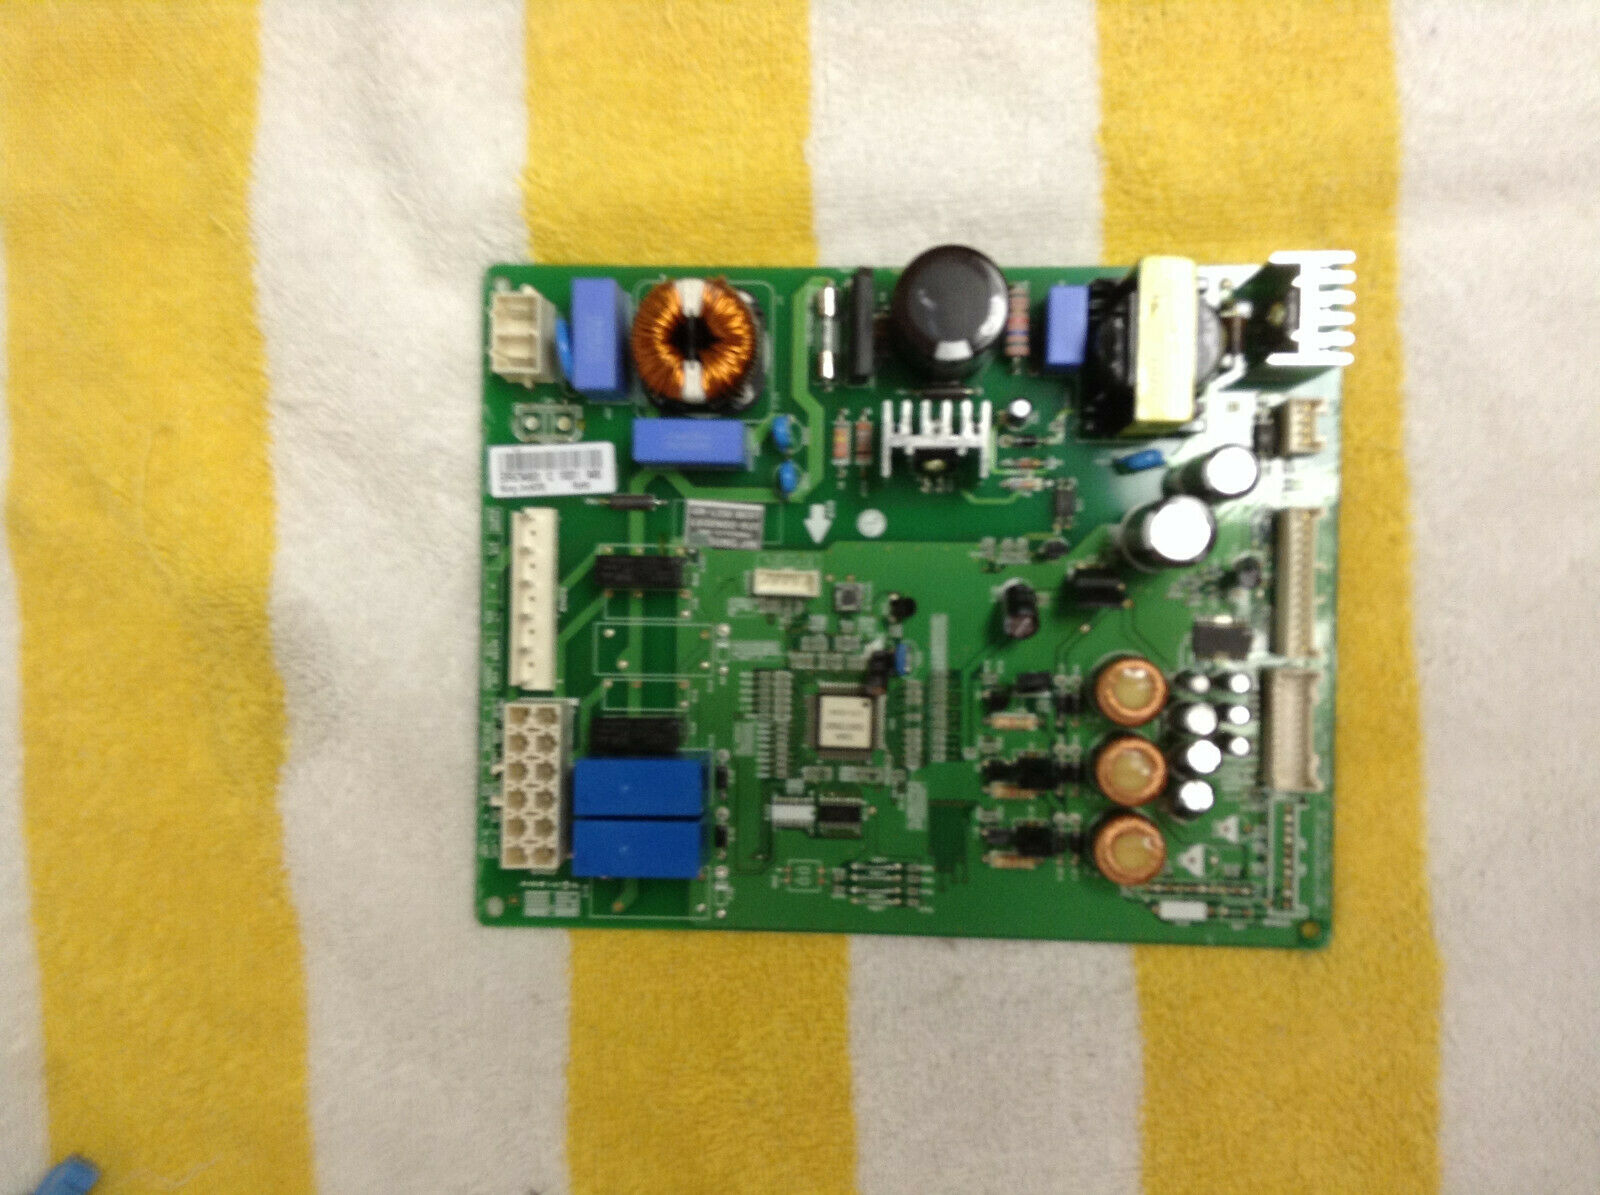 LG Refrigerator Electronic Control Board  EBR67348001 free shipping